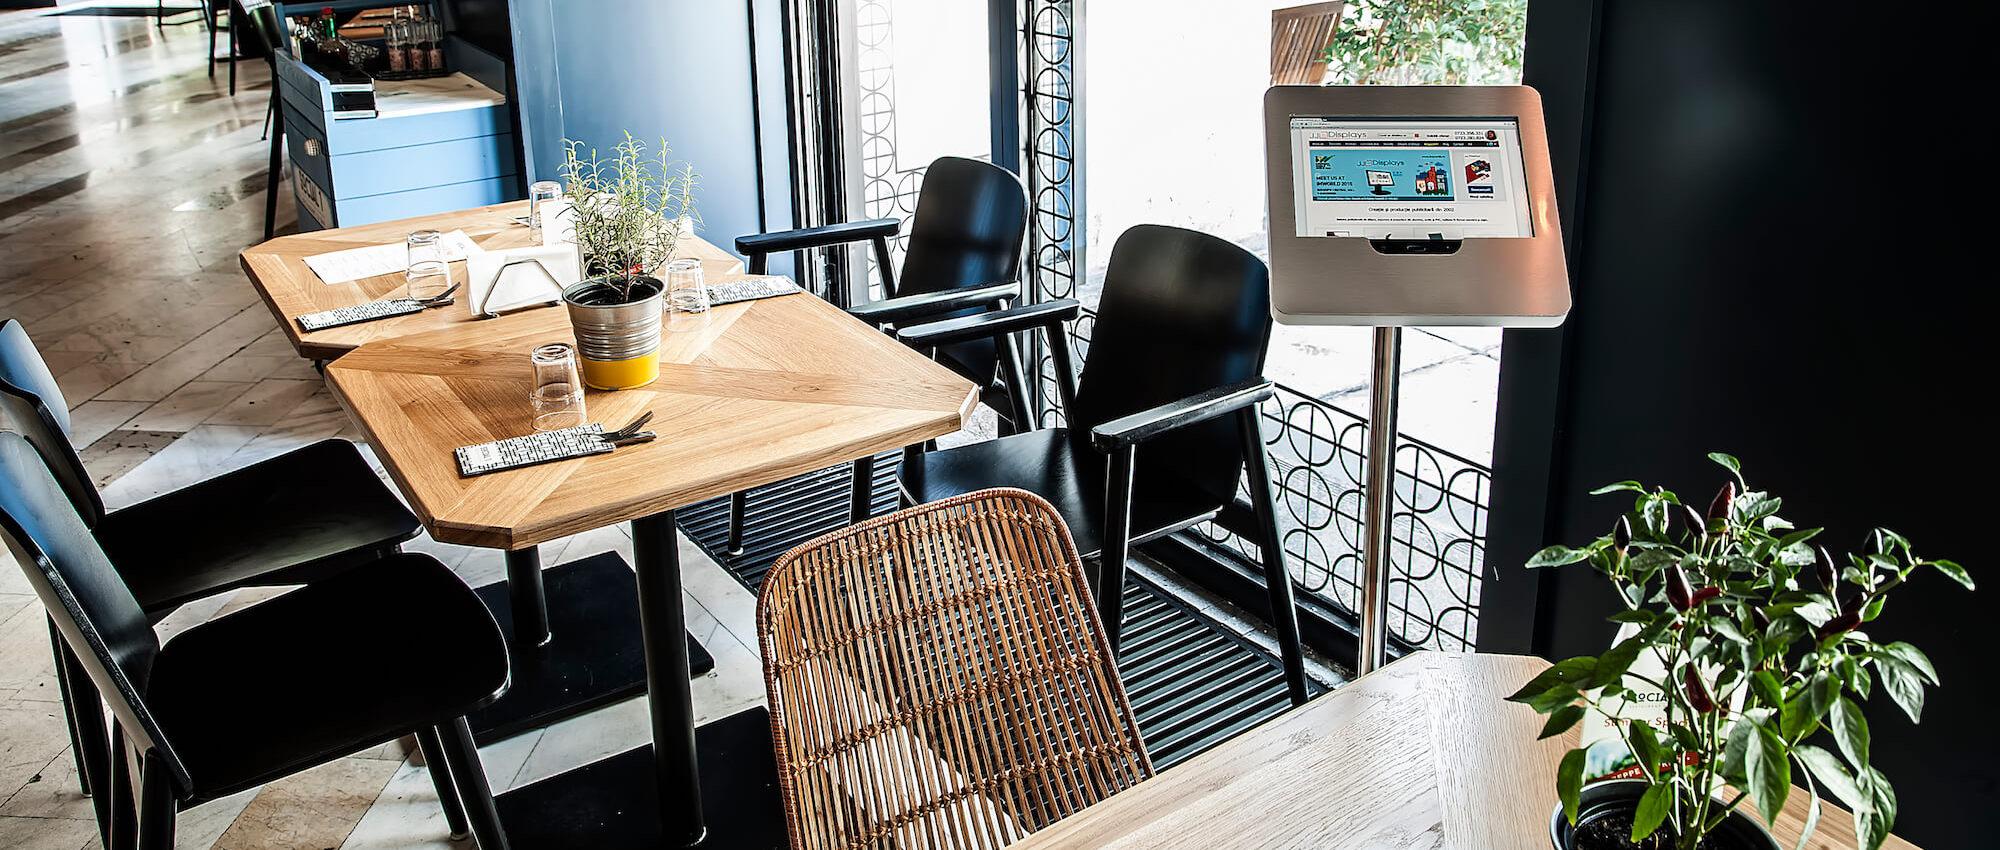 Tablet Kiosk Stand | iPad Kiosk | DE